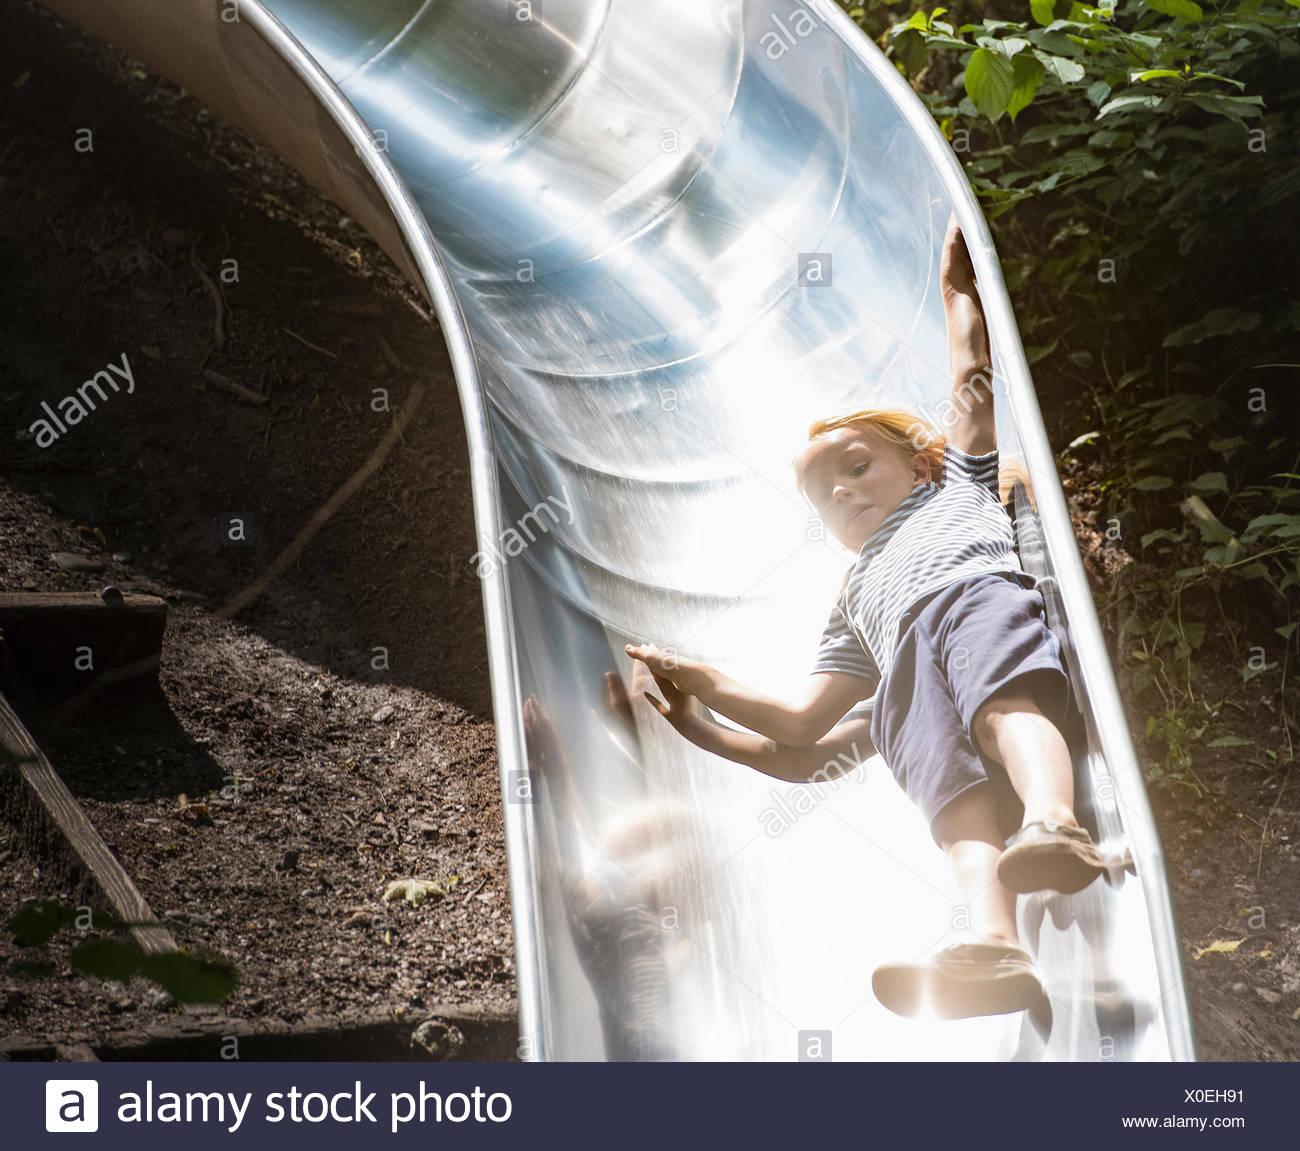 Boy sliding down playground slide - Stock Image